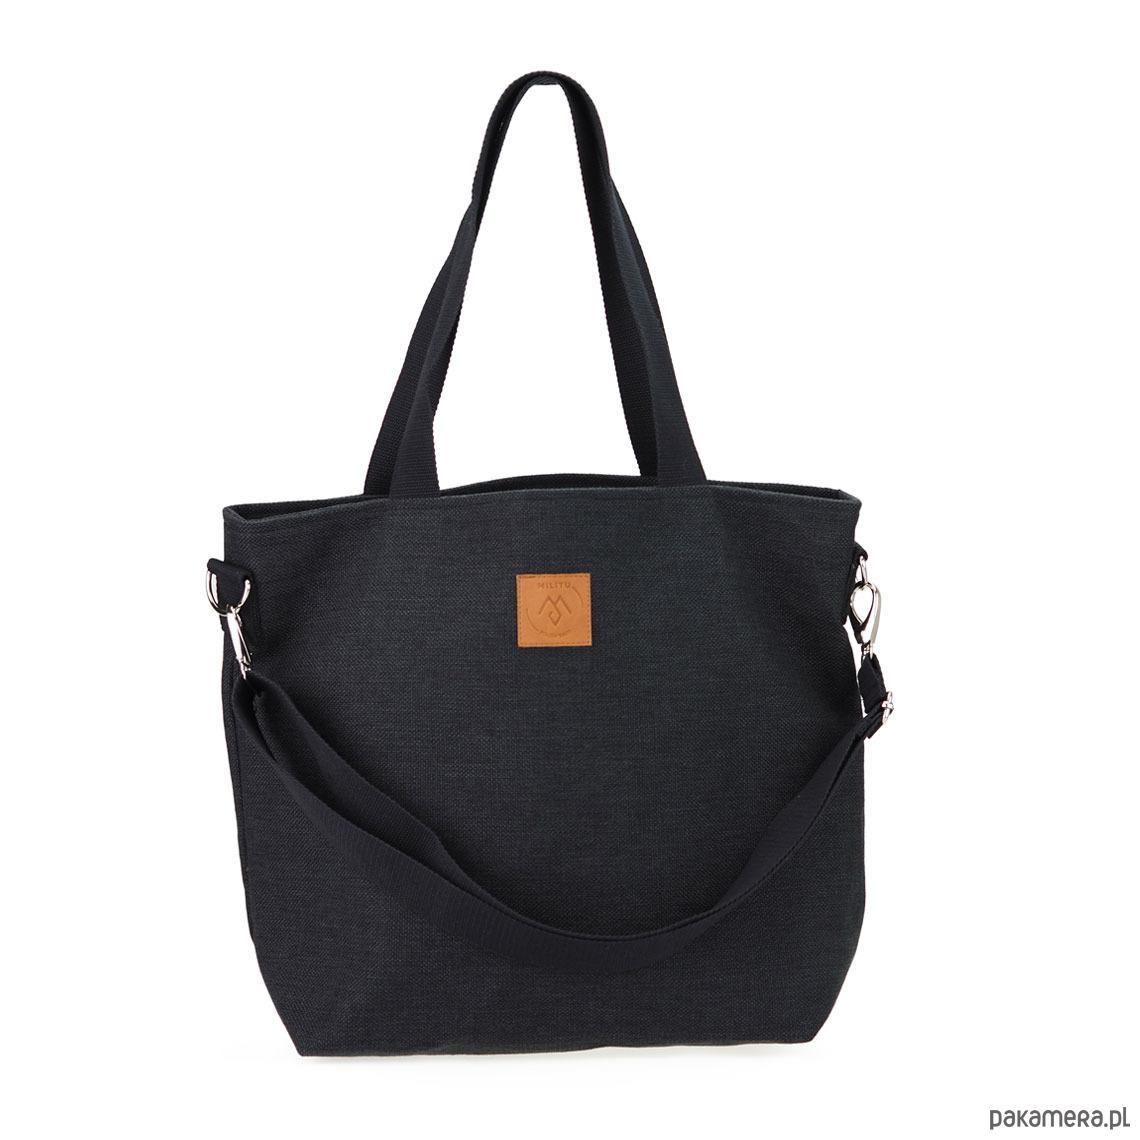 Duża torba shopperka Mili Duo czarna